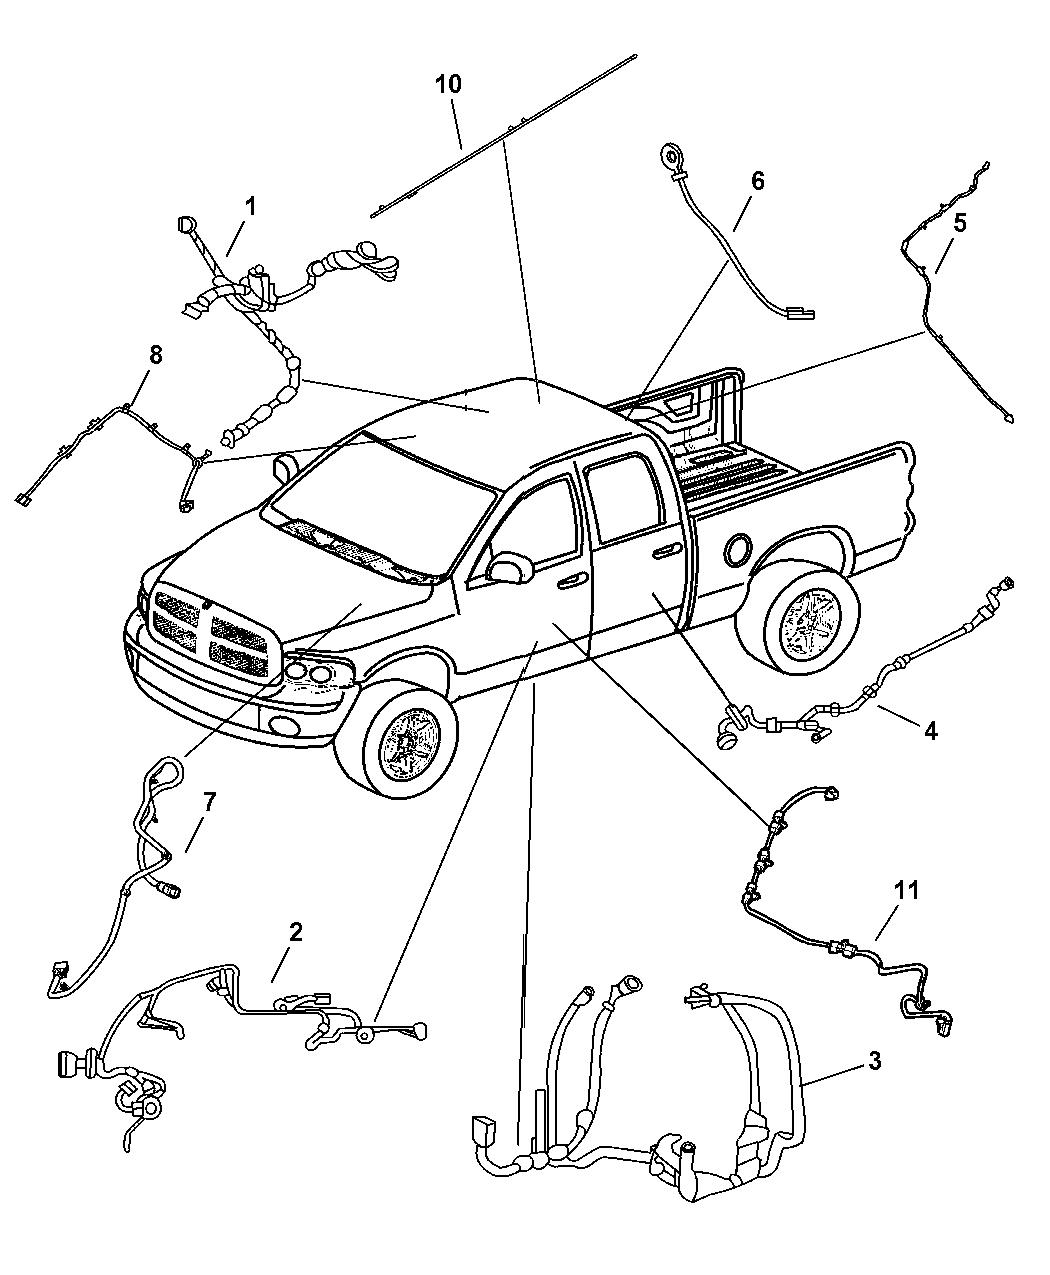 2007 Dodge Ram 1500 Wiring Body Front